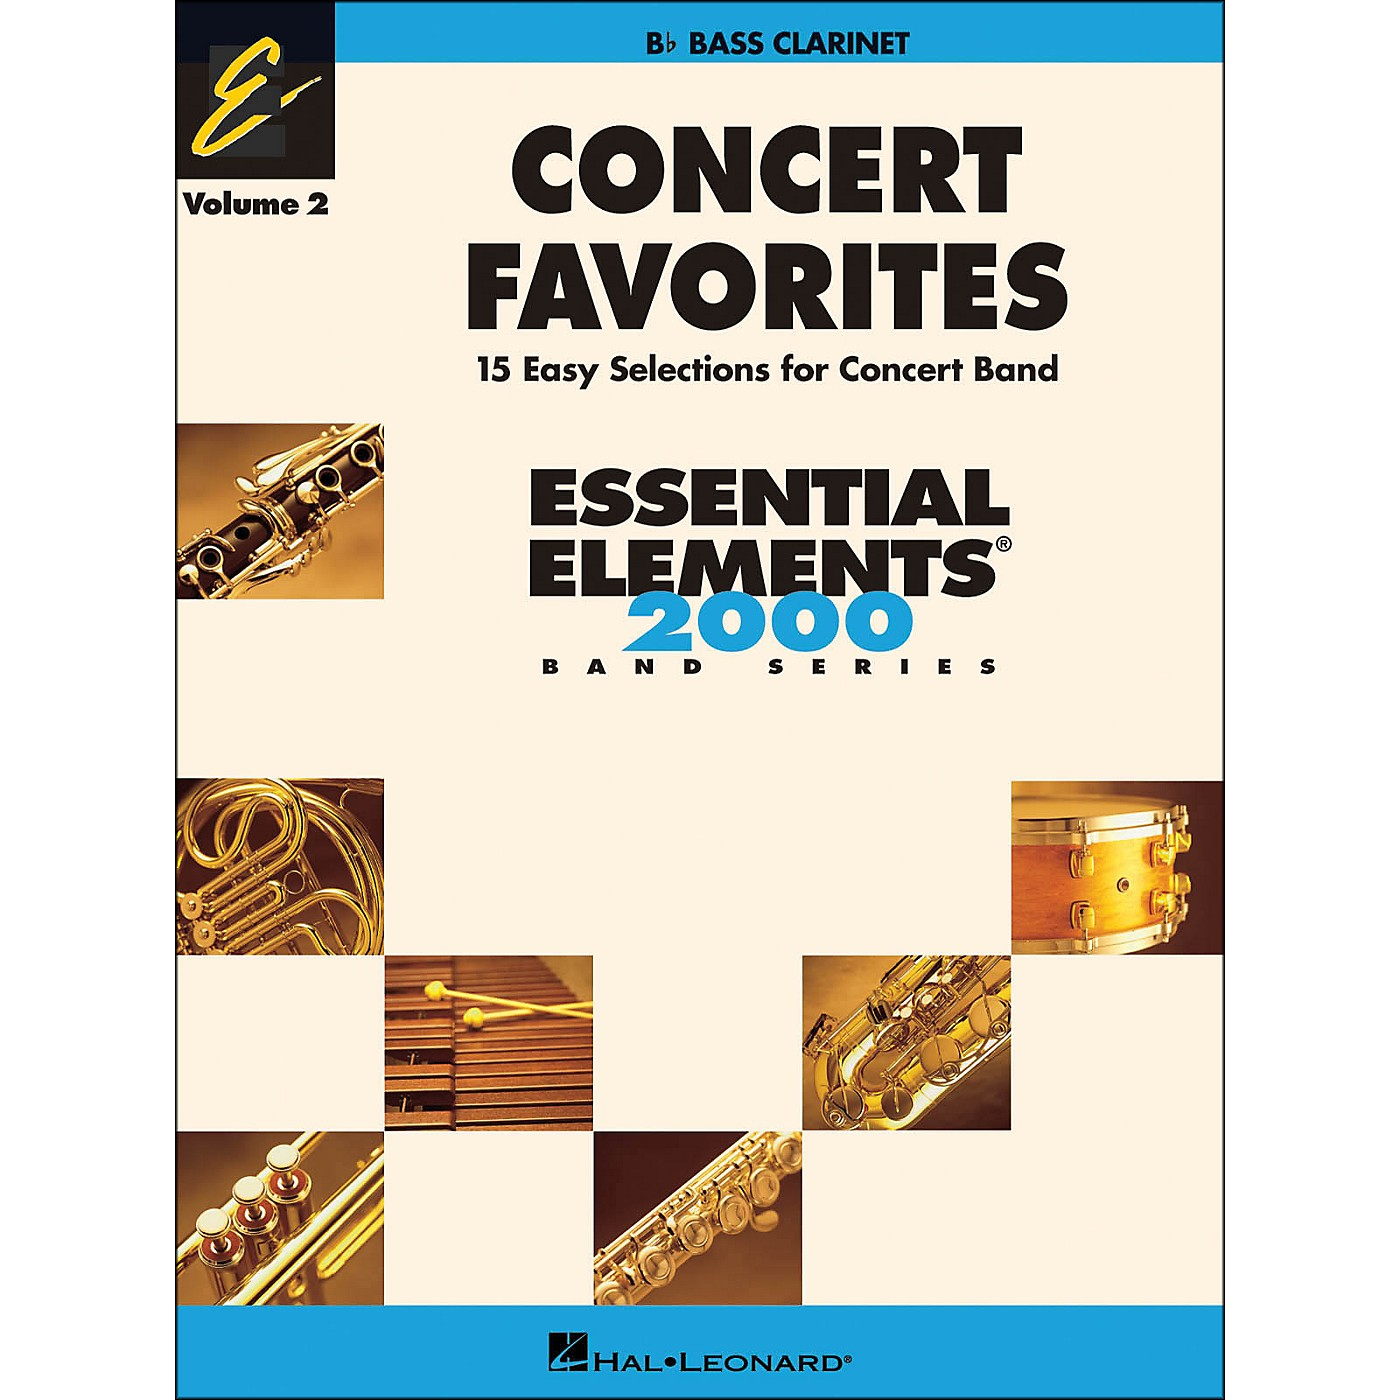 Hal Leonard Concert Favorites Volume 2 Bass Clarinet Essential Elements Band Series thumbnail